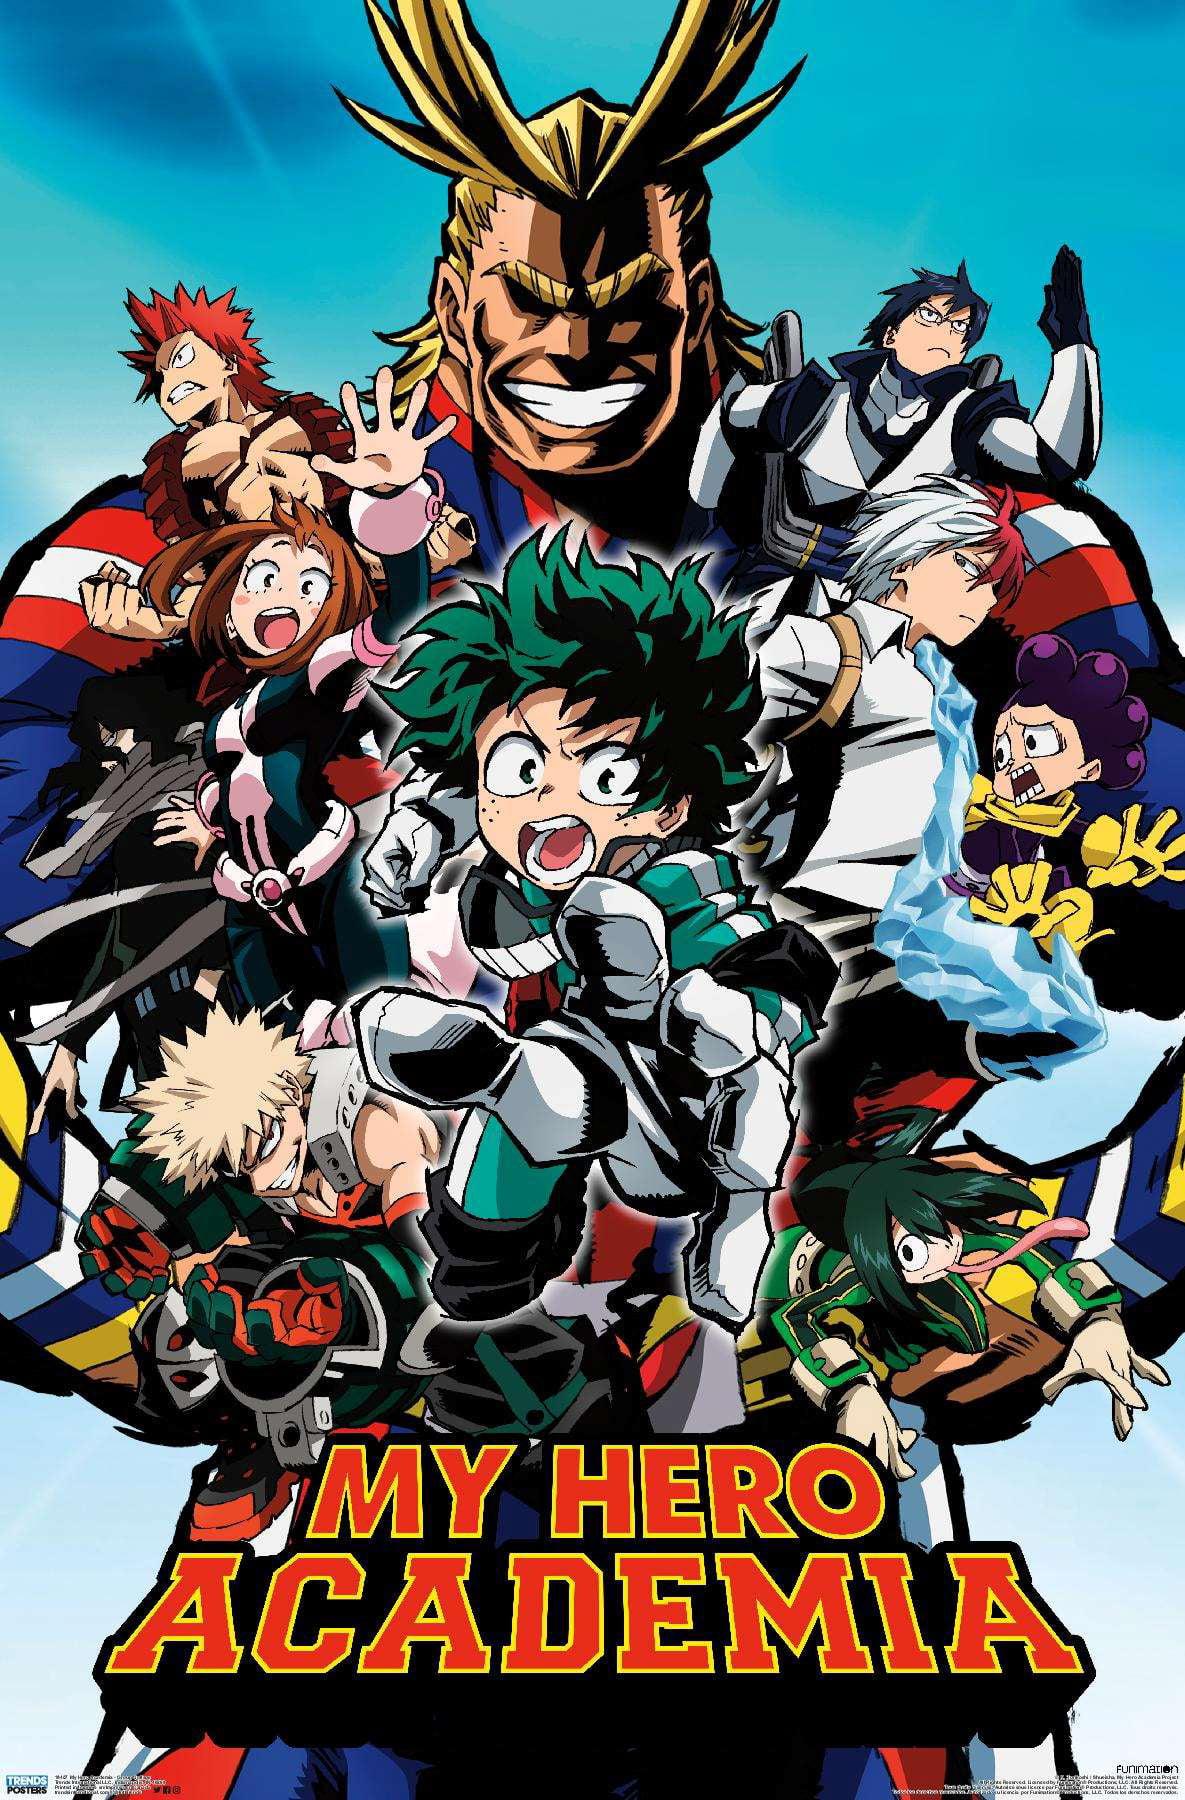 My Hero Academia - Group Collage Poster - Walmart.com ...